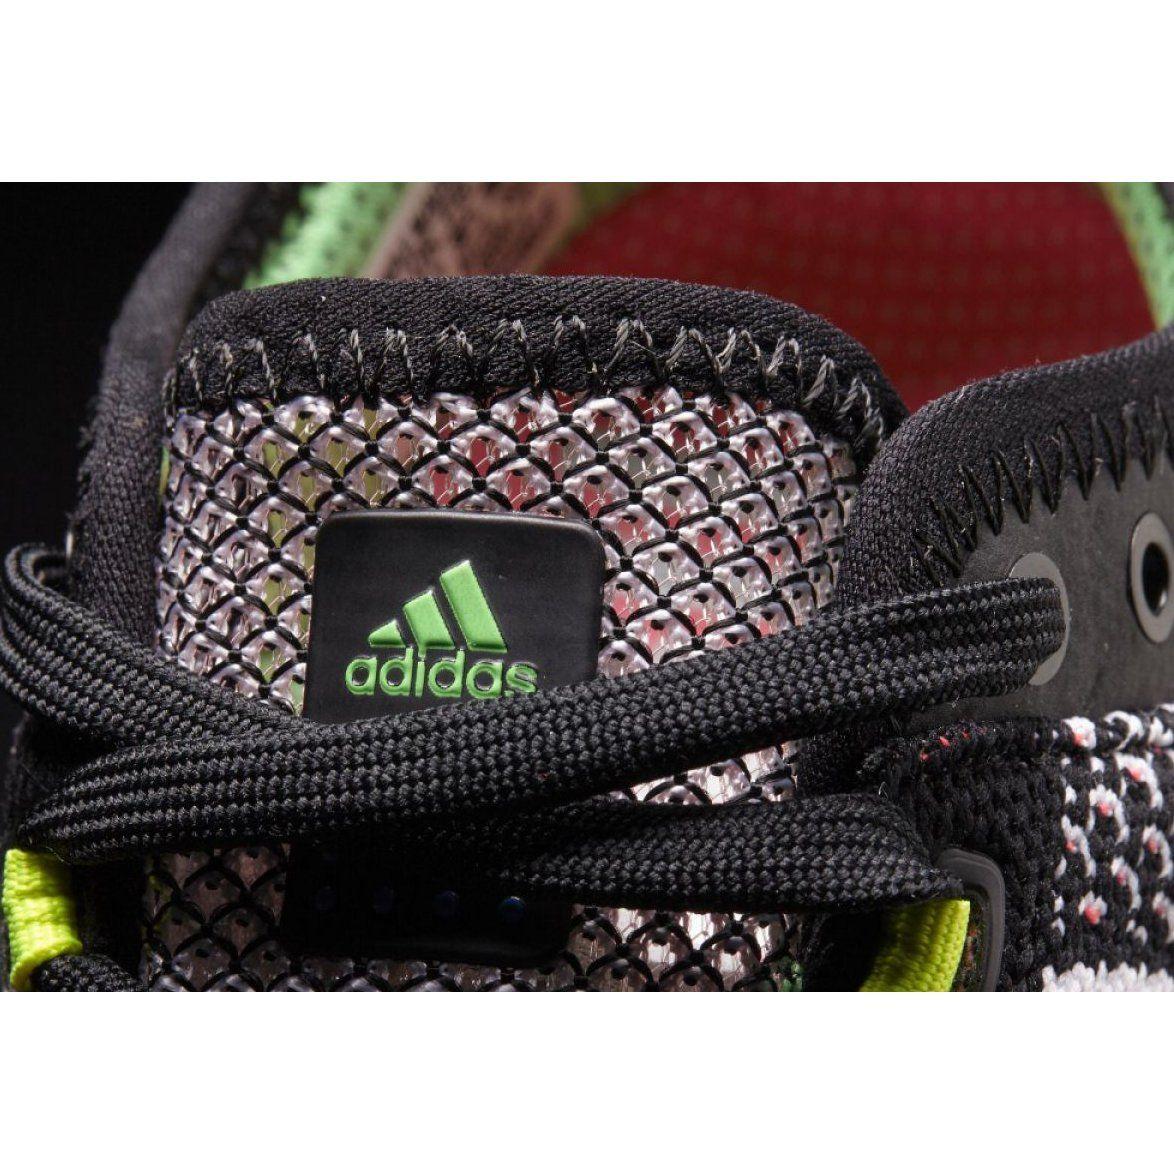 Running Shoes Adidas Cc Cosmic Boost W B34374 Black Multicolored Adidas Running Shoes Adidas Shoes Running Shoes